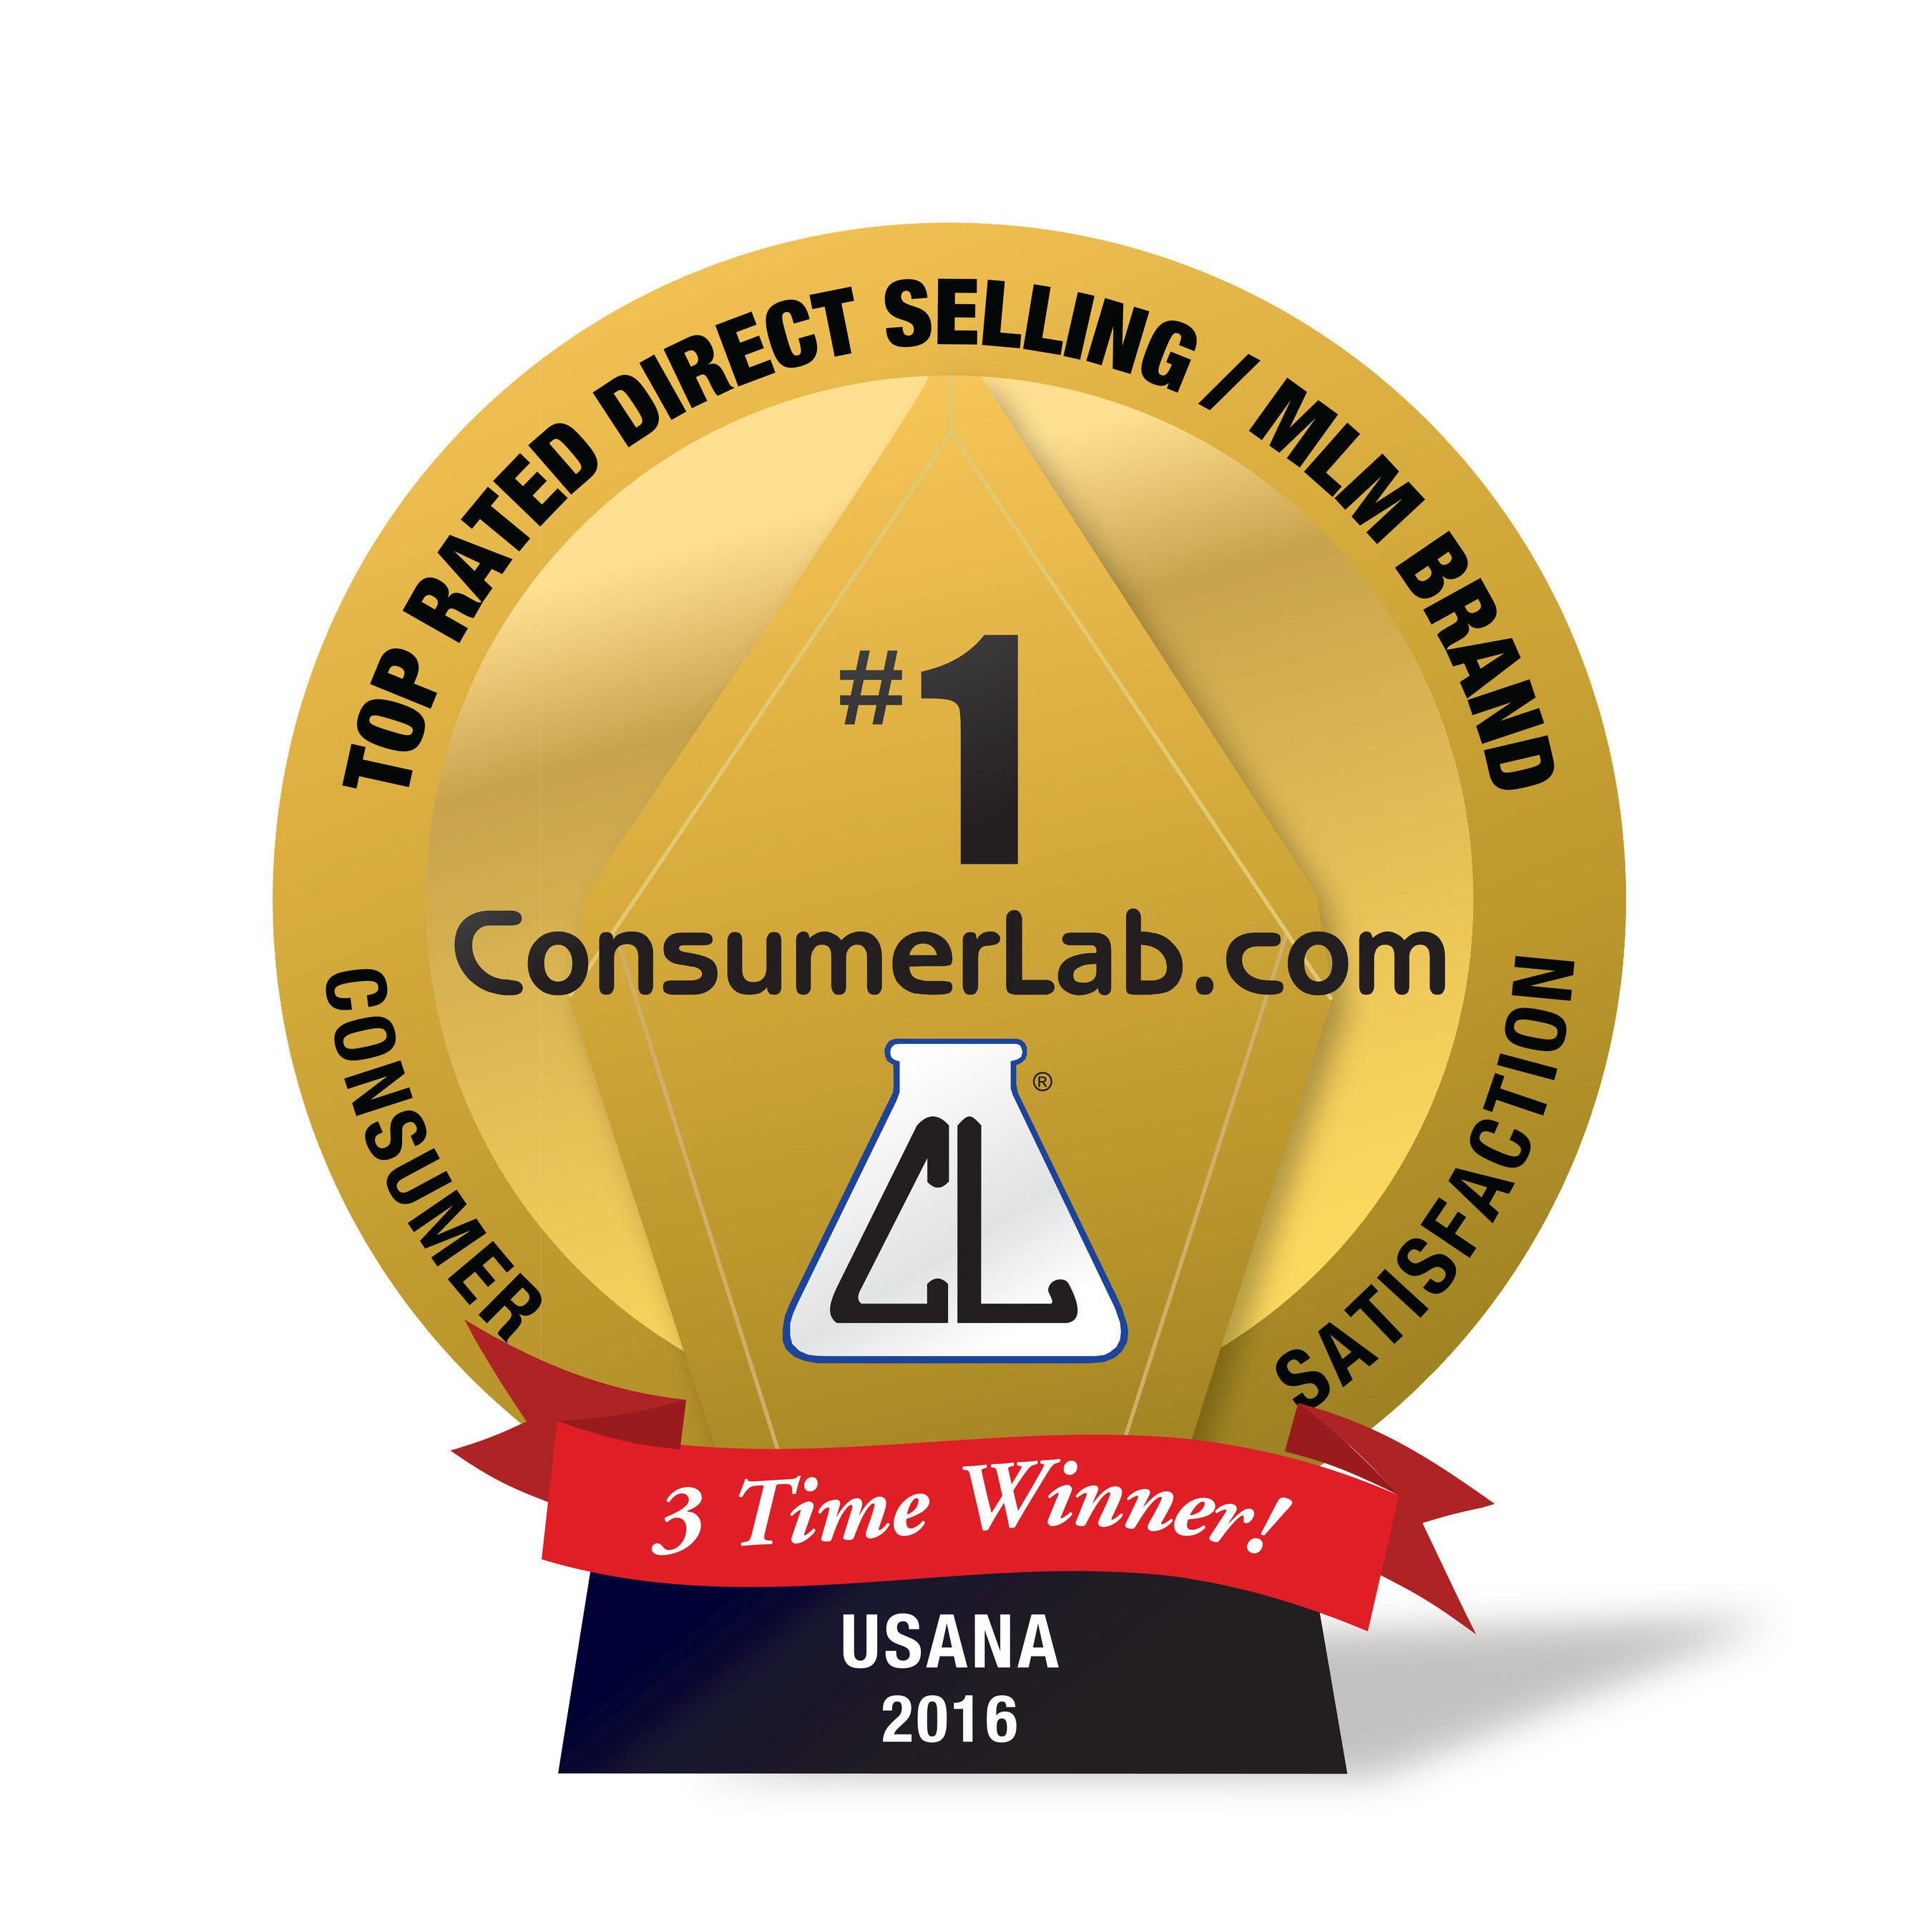 ConsumerLab.com Best Brand Award logo for Three-Time Winner USANA